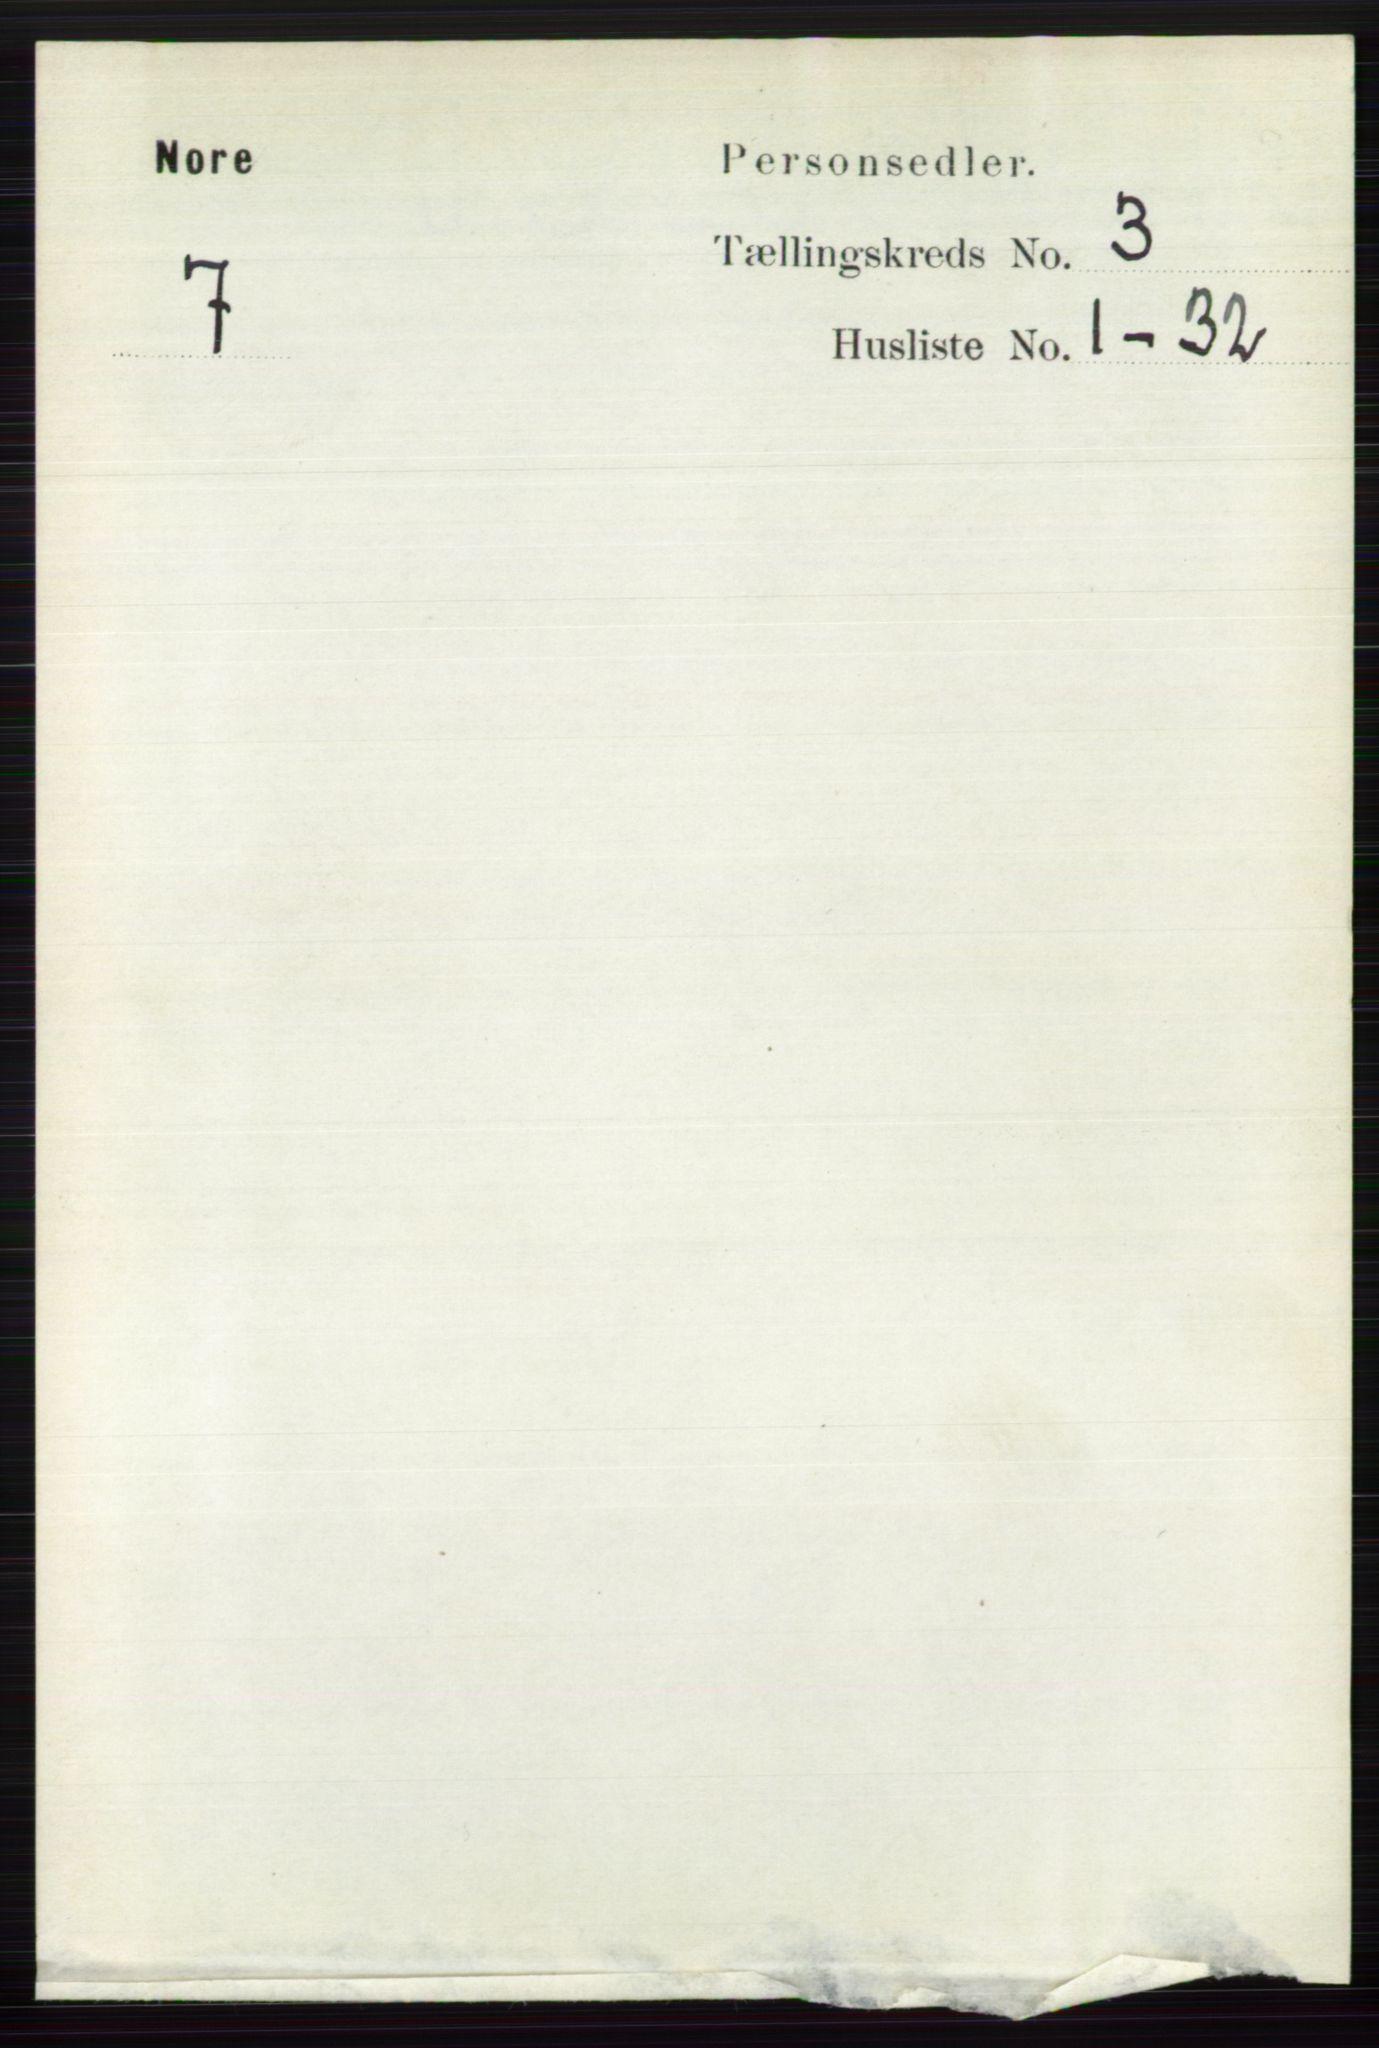 RA, Folketelling 1891 for 0633 Nore herred, 1891, s. 741